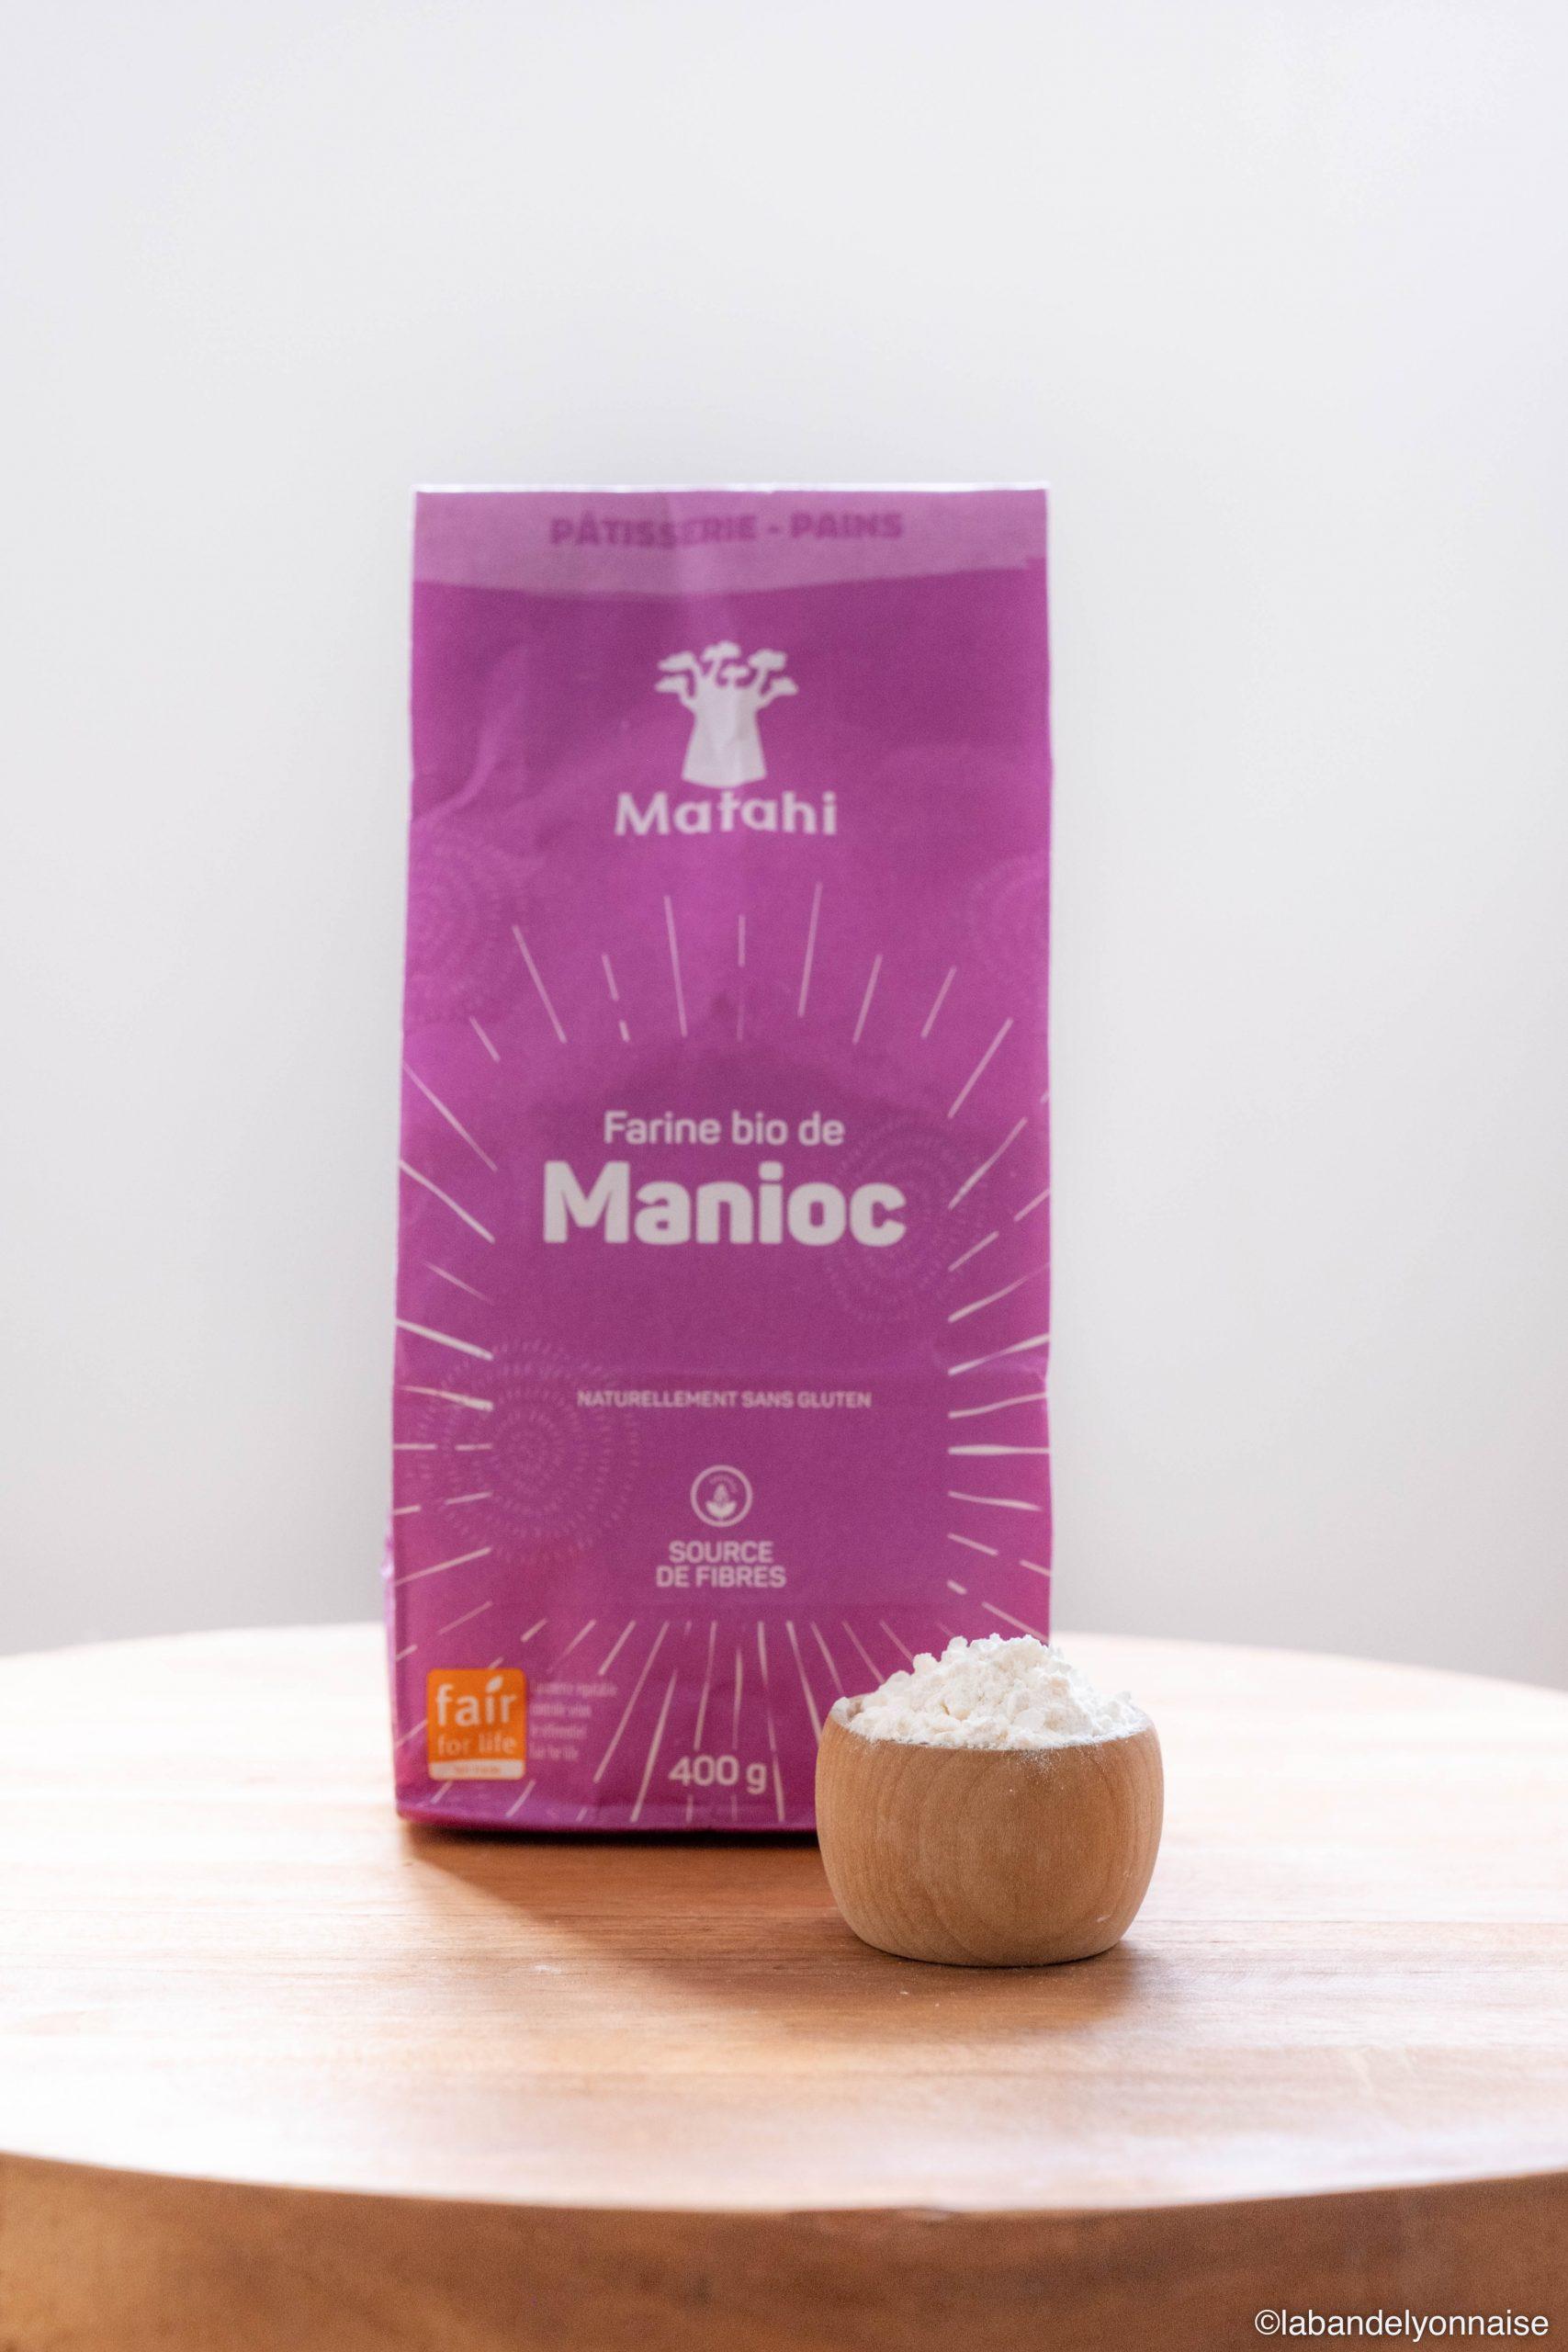 matahi visuel1 ©labandelyonnaise scaled - Farine de manioc MATAHI : une nouvelle farine Bio, sans gluten et équitable